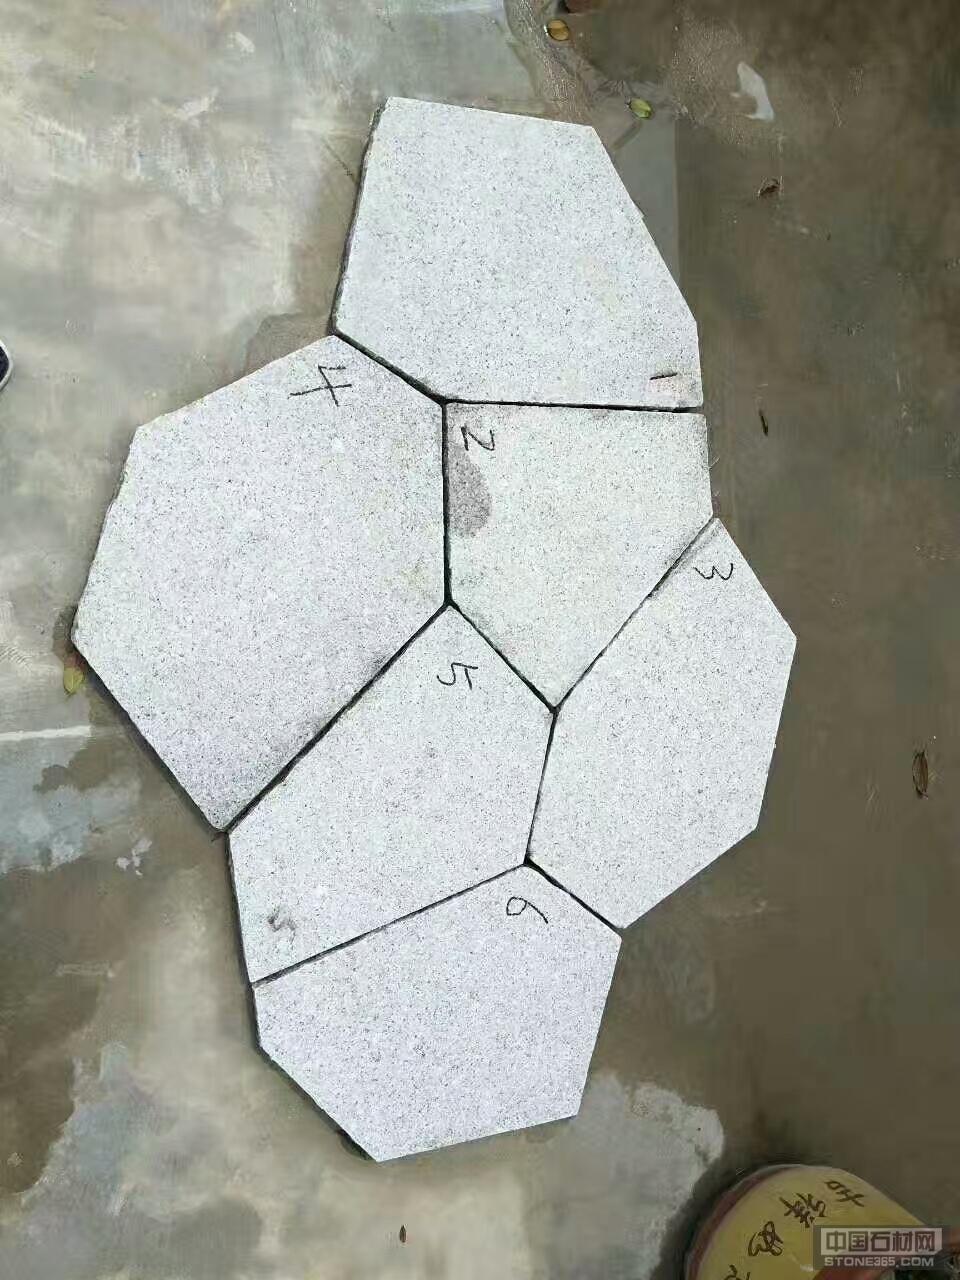 山东锈石冰裂纹